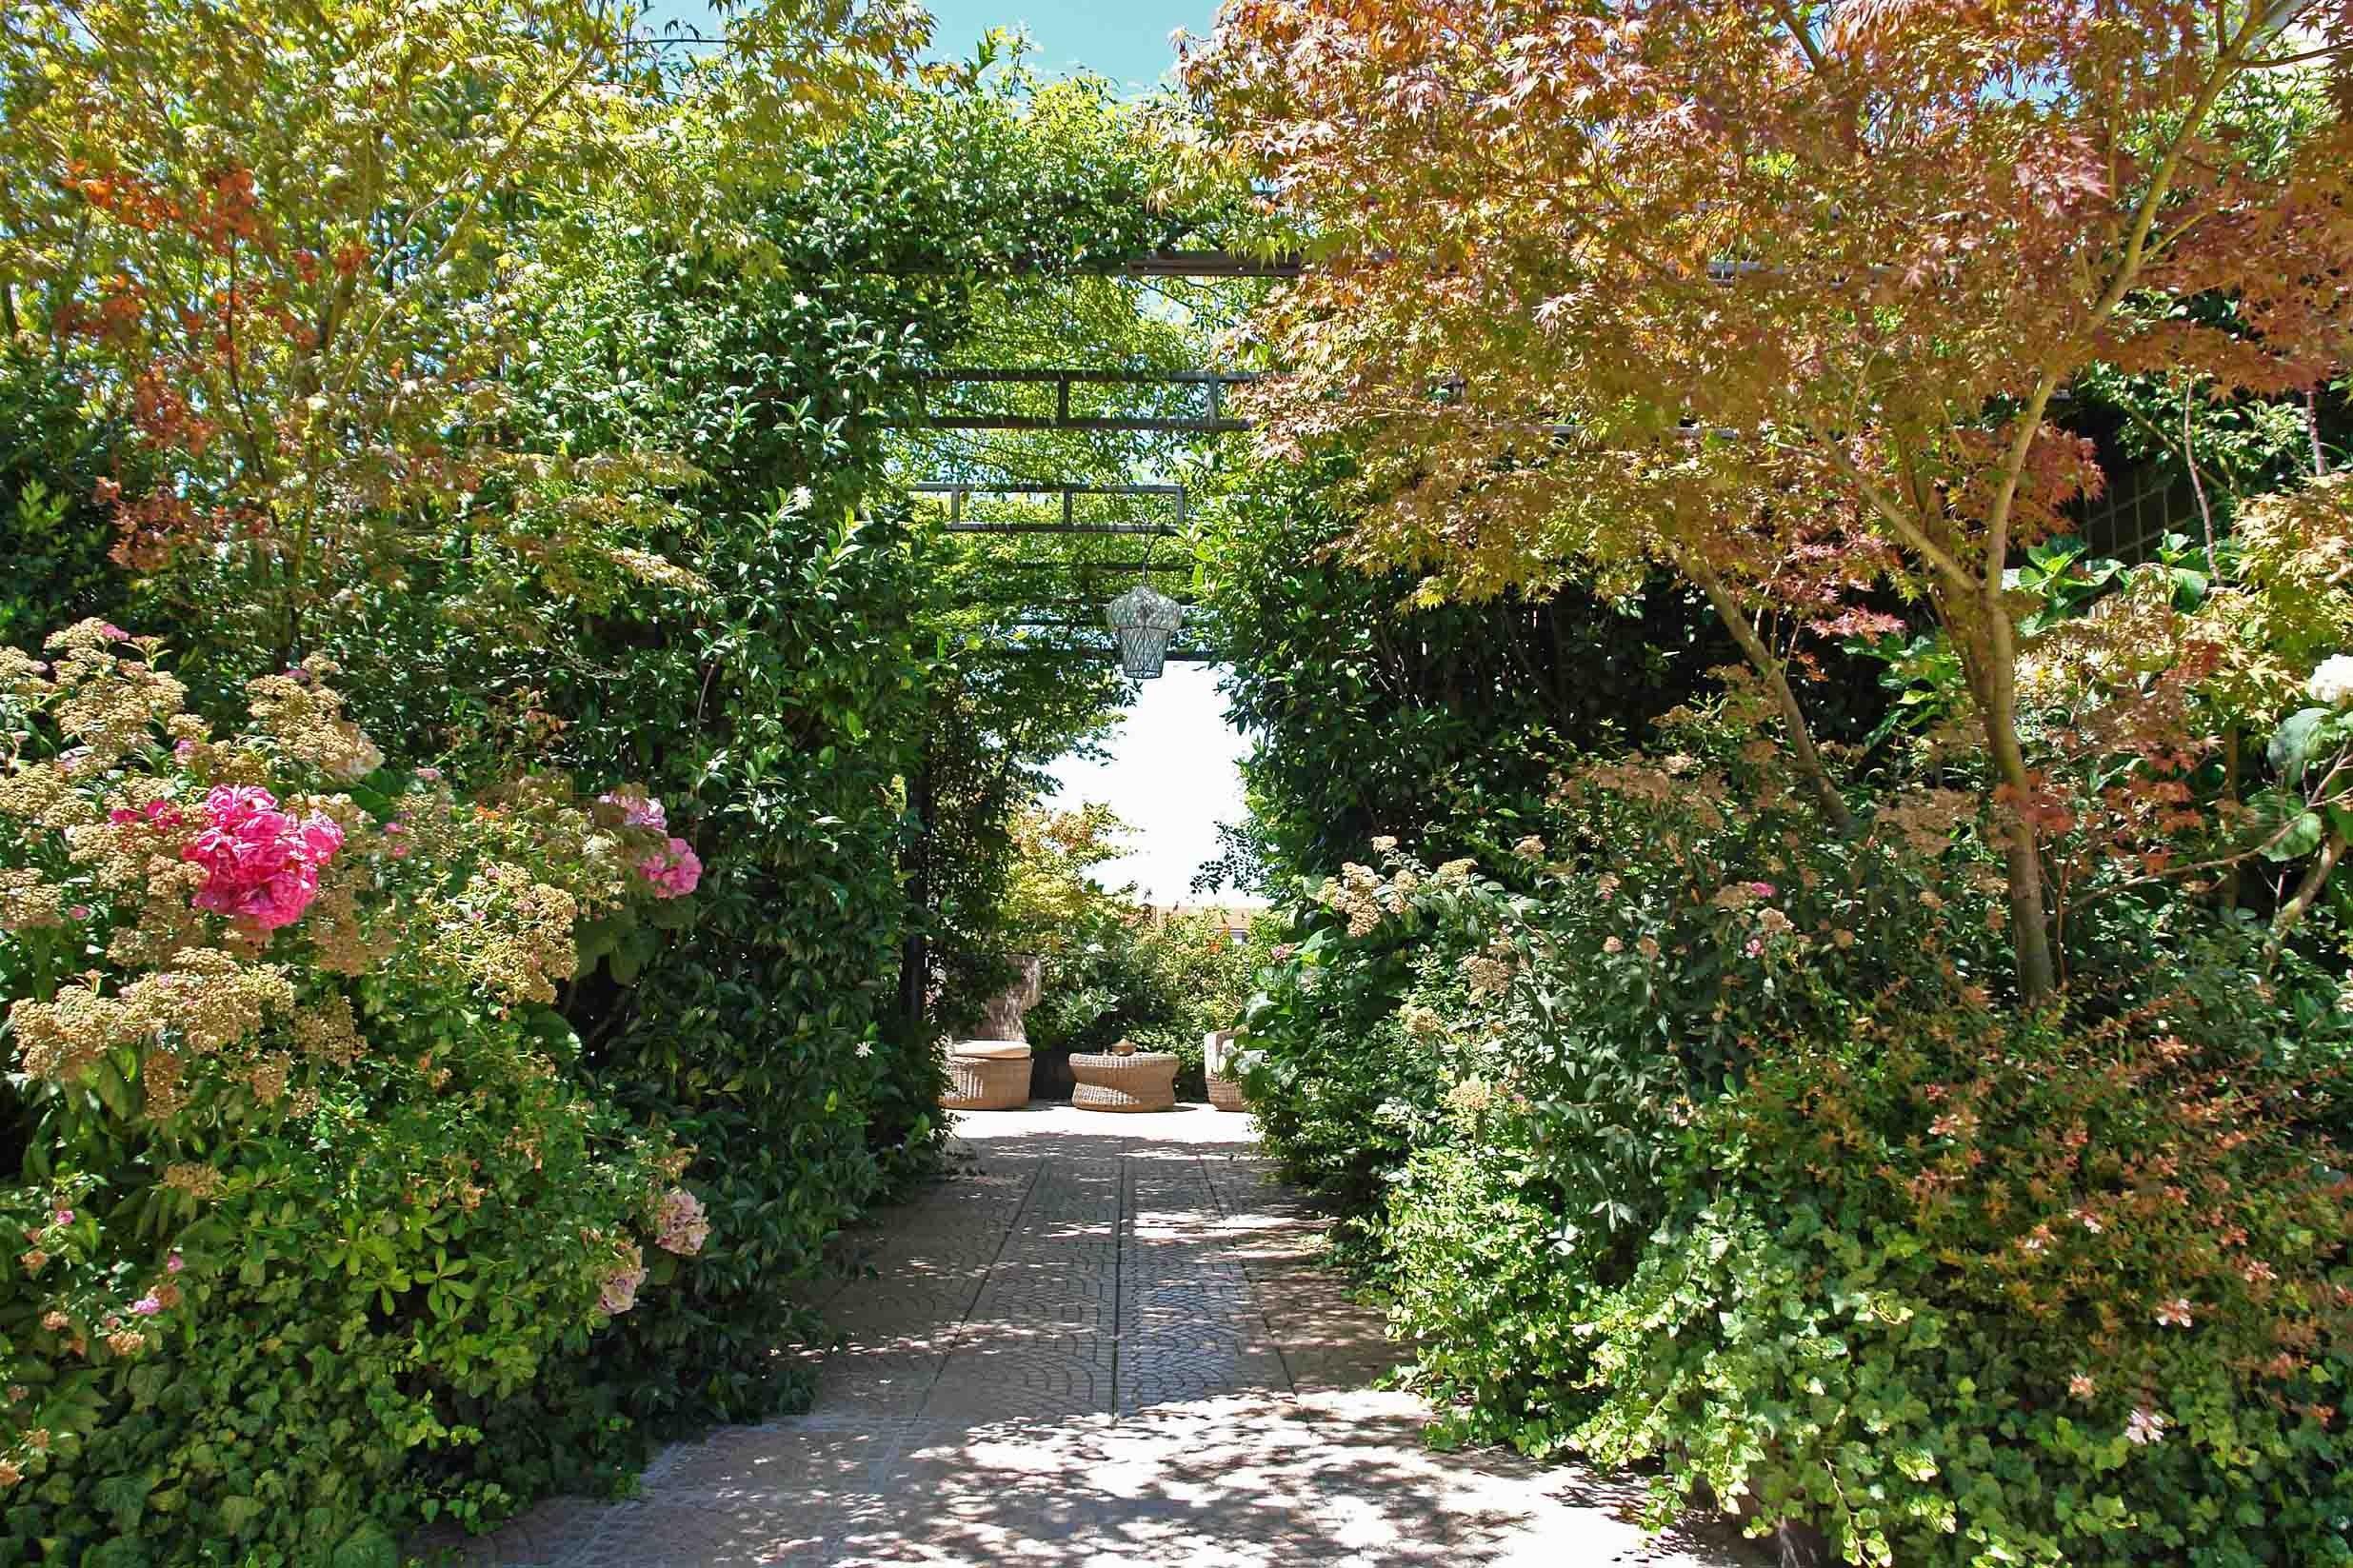 Stanze vegetali - Terrazze